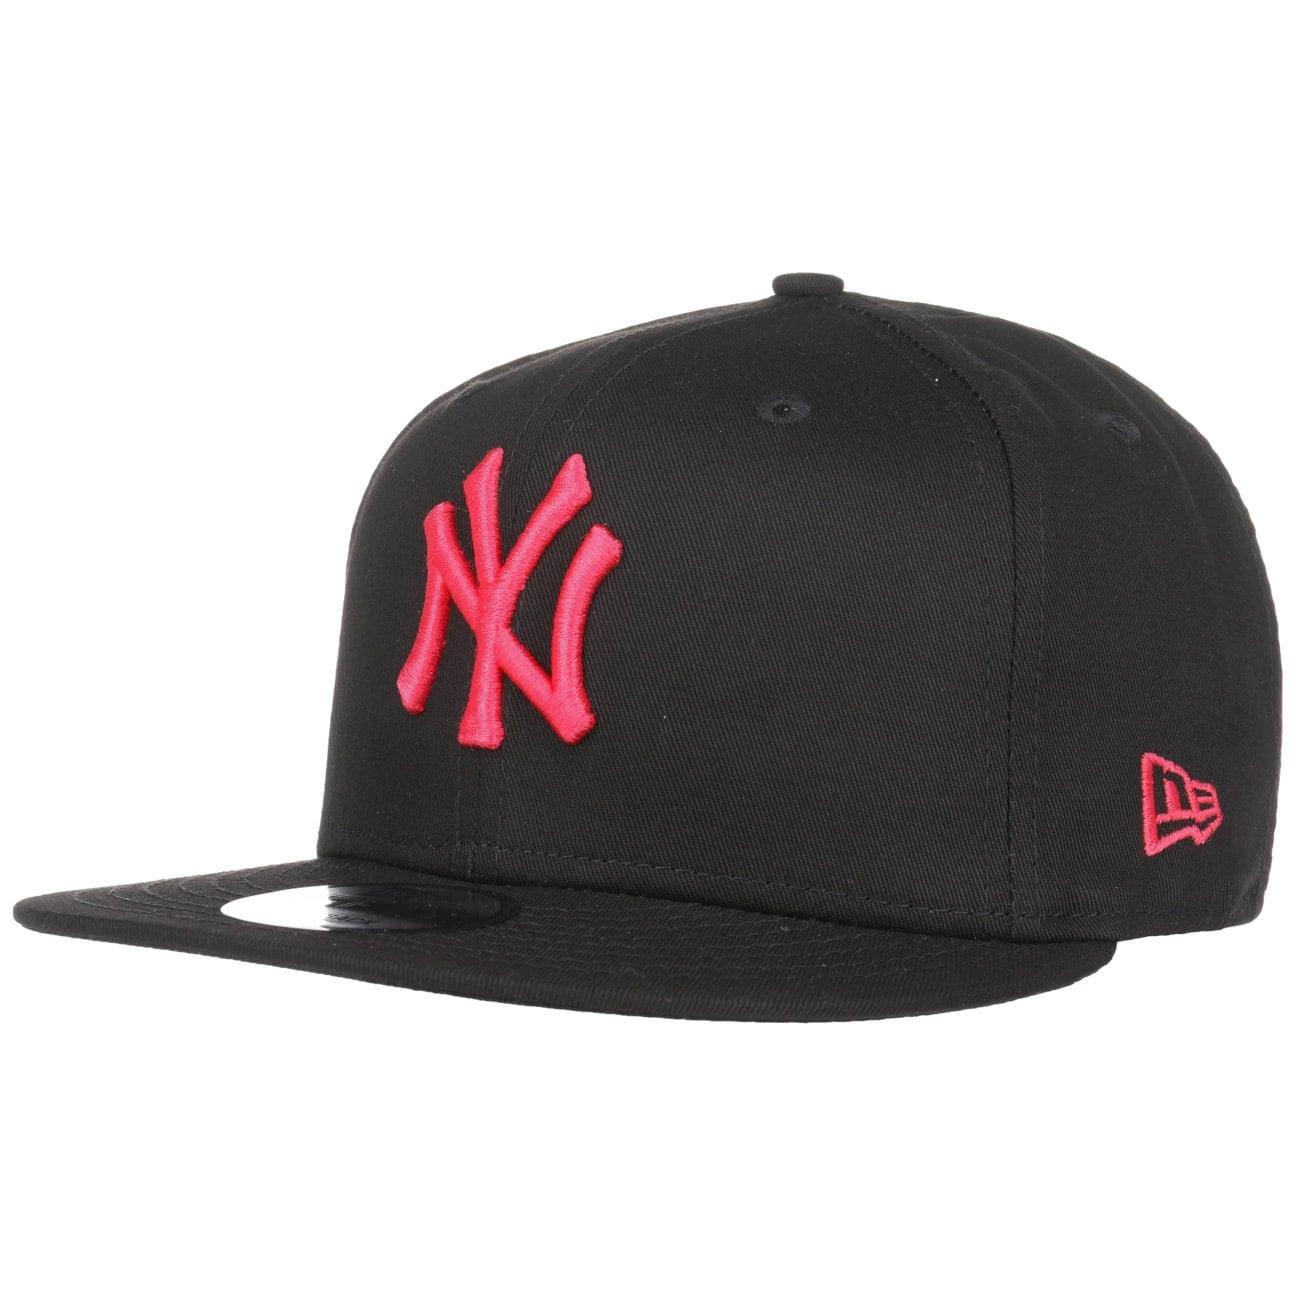 9fifty-league-ess-yankees-cap-by-new-era-basecap